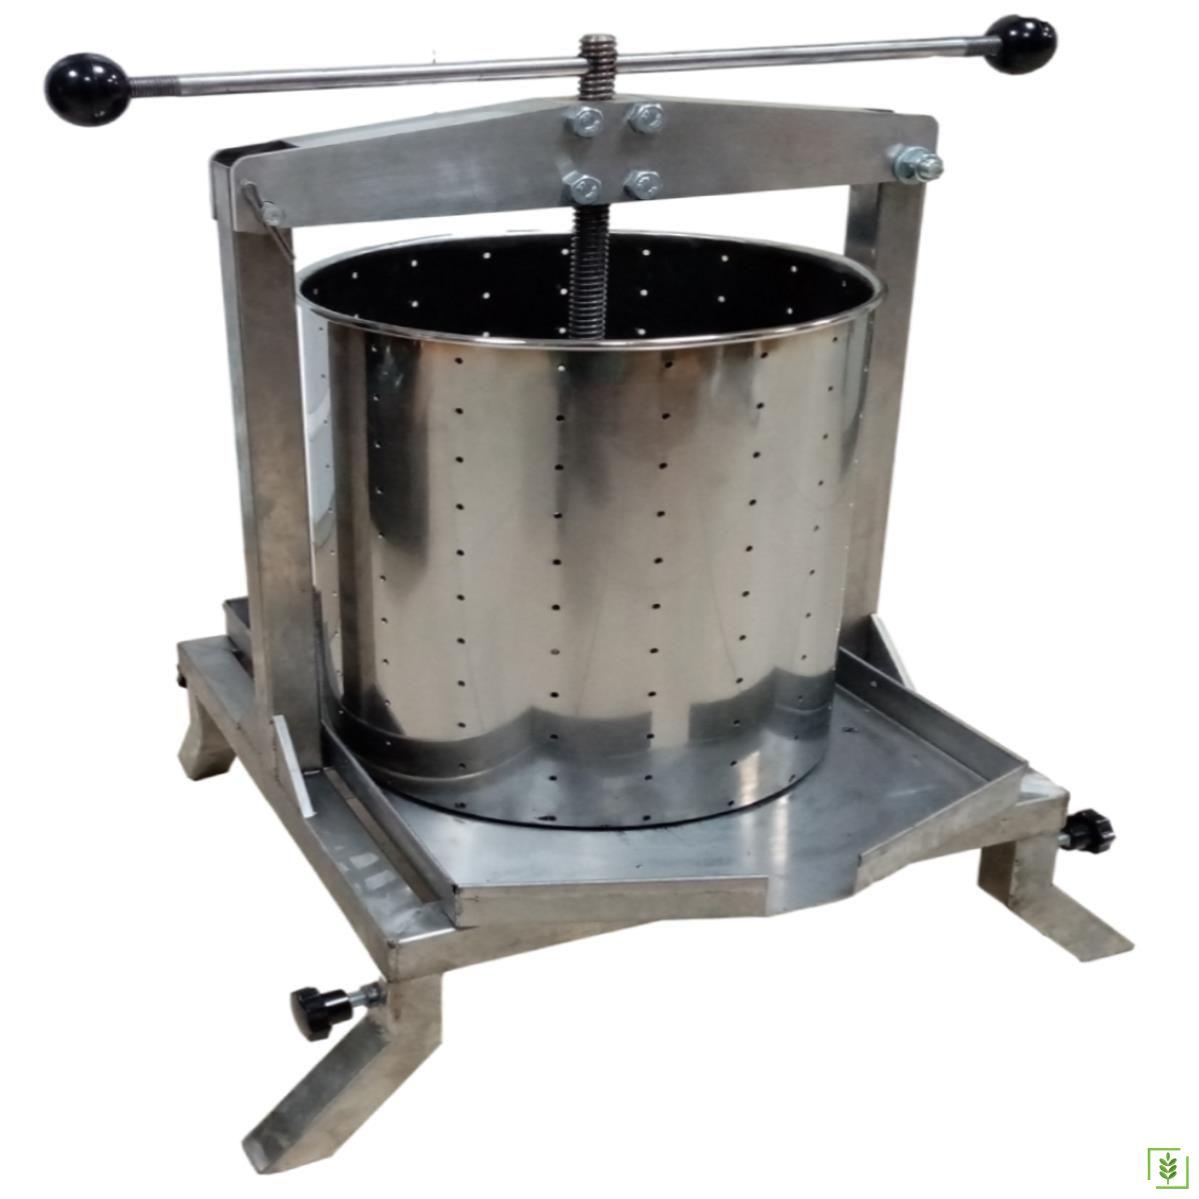 Pars PRS-50 Paslanmaz Çelik Meyve Sıkma Pres Makinesi 50 Lt